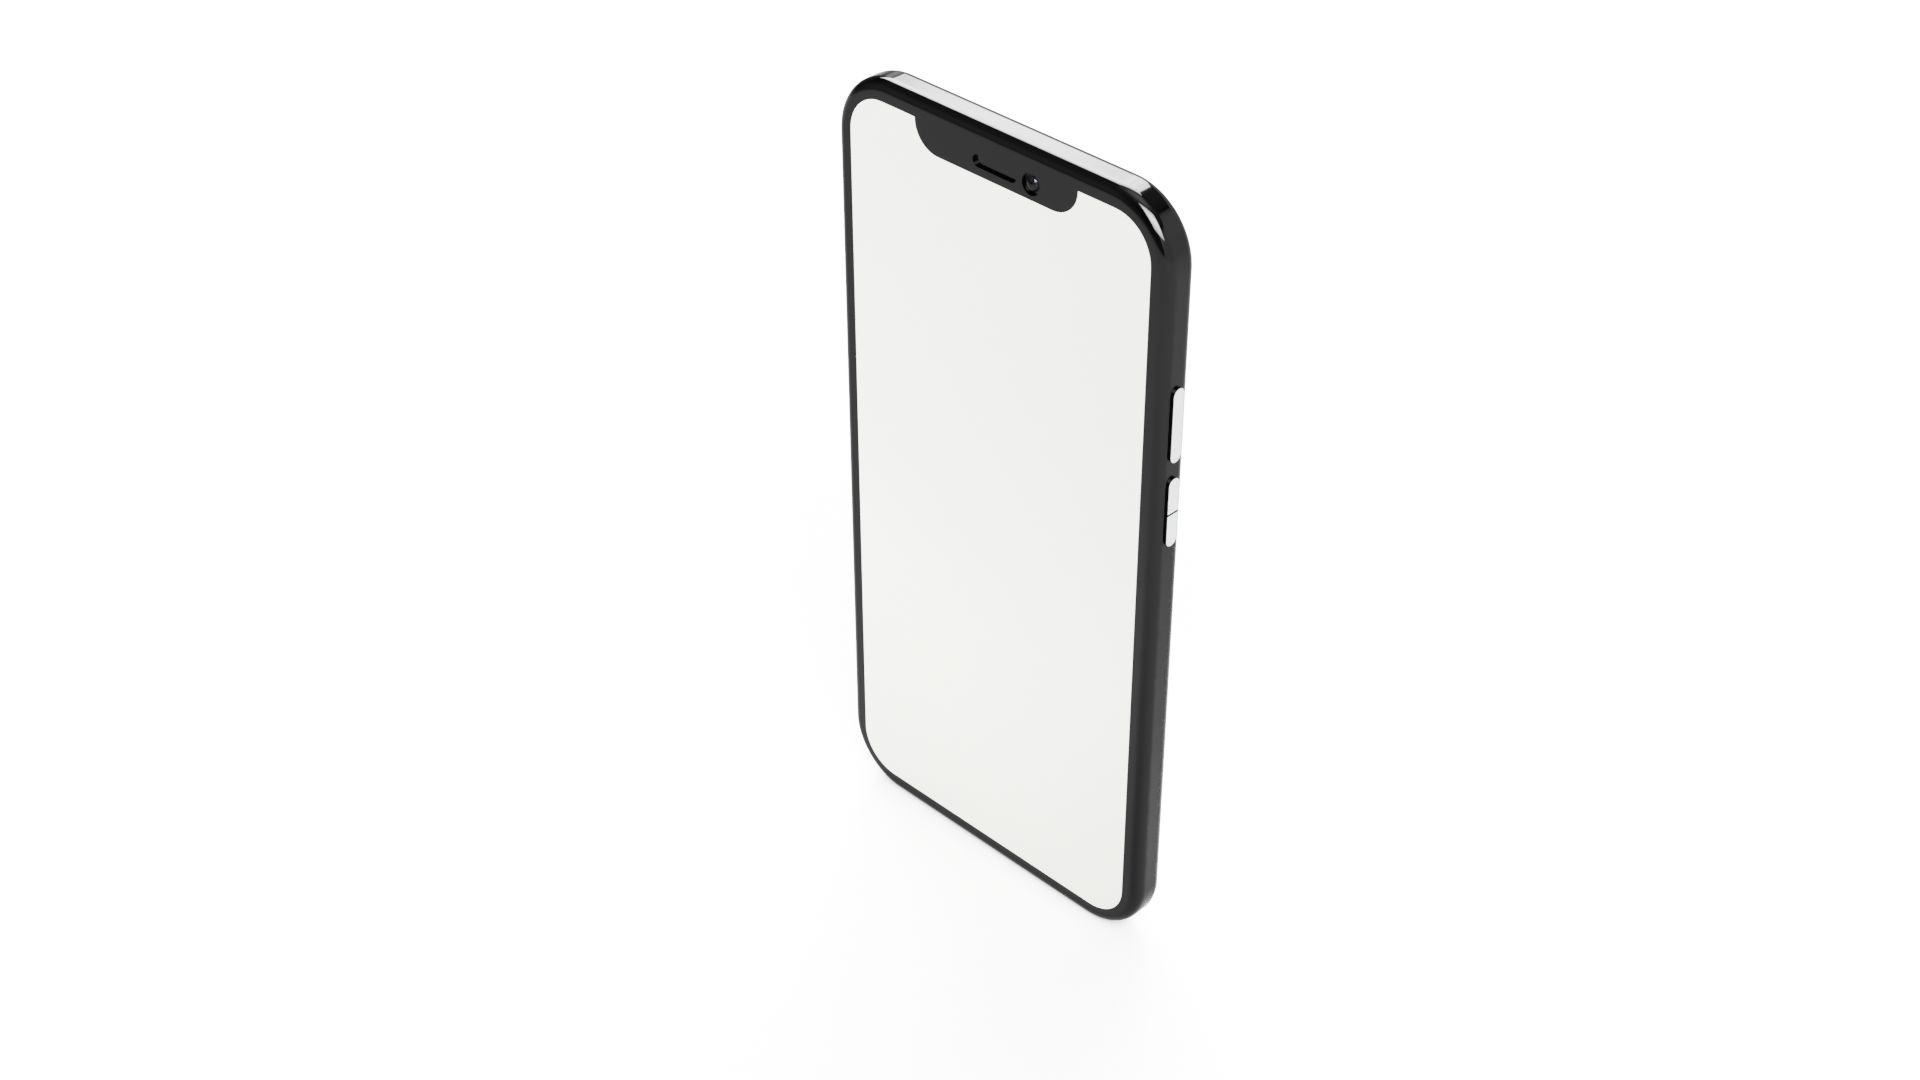 Iphone-2-3500-3500